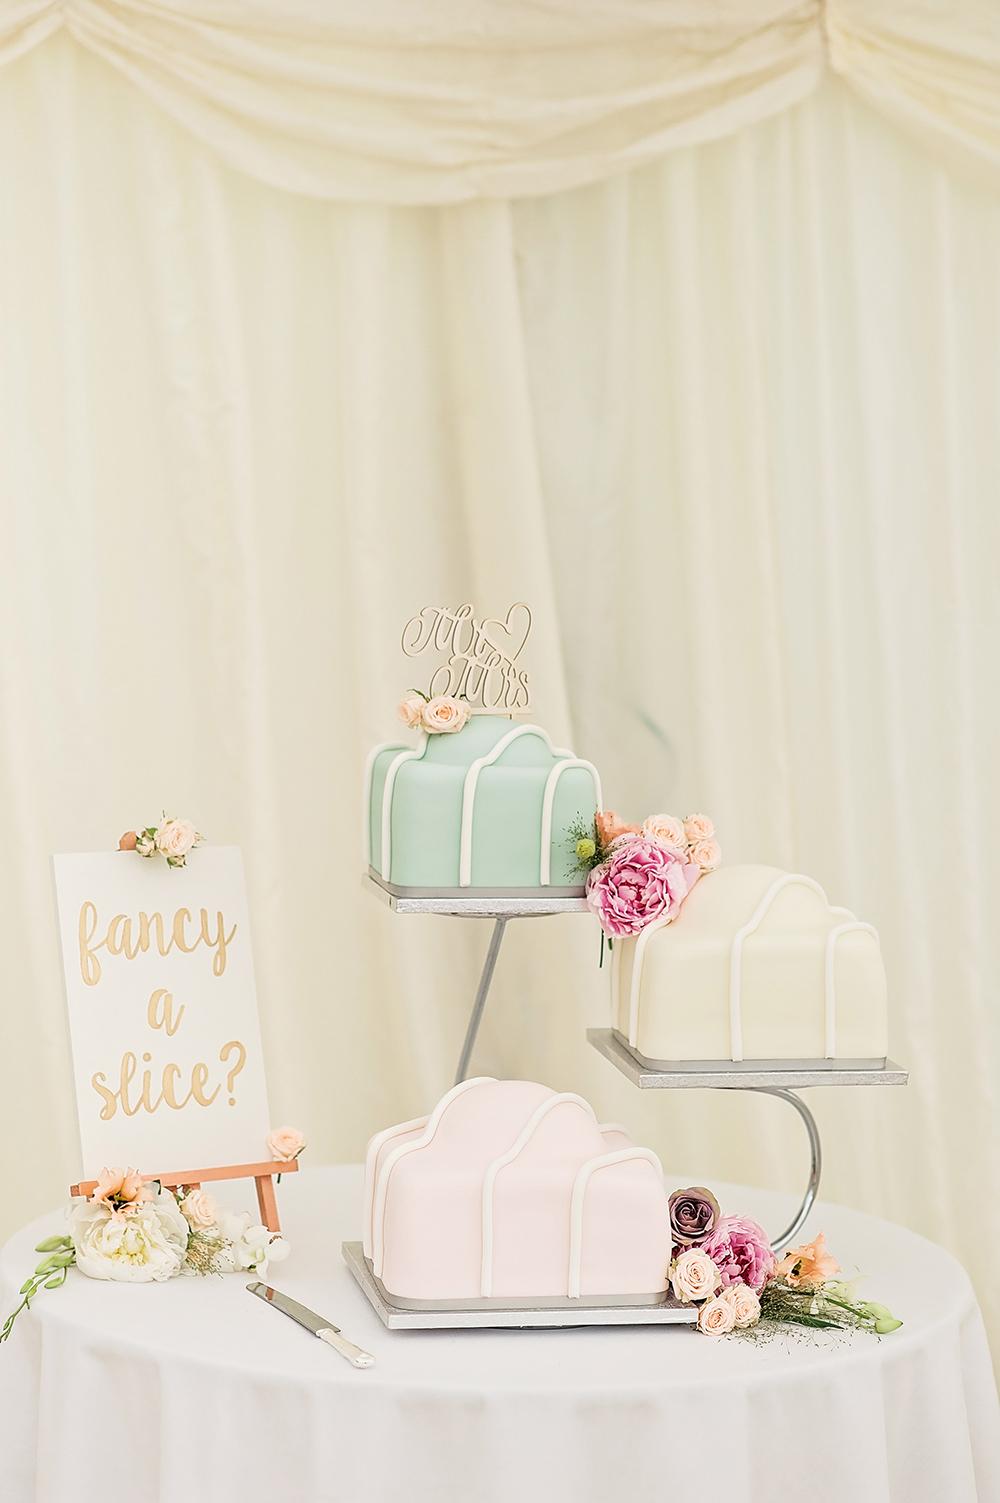 French Fancy Cake Slice Fancy A slice Edmondsham House Wedding Darima Frampton Photography